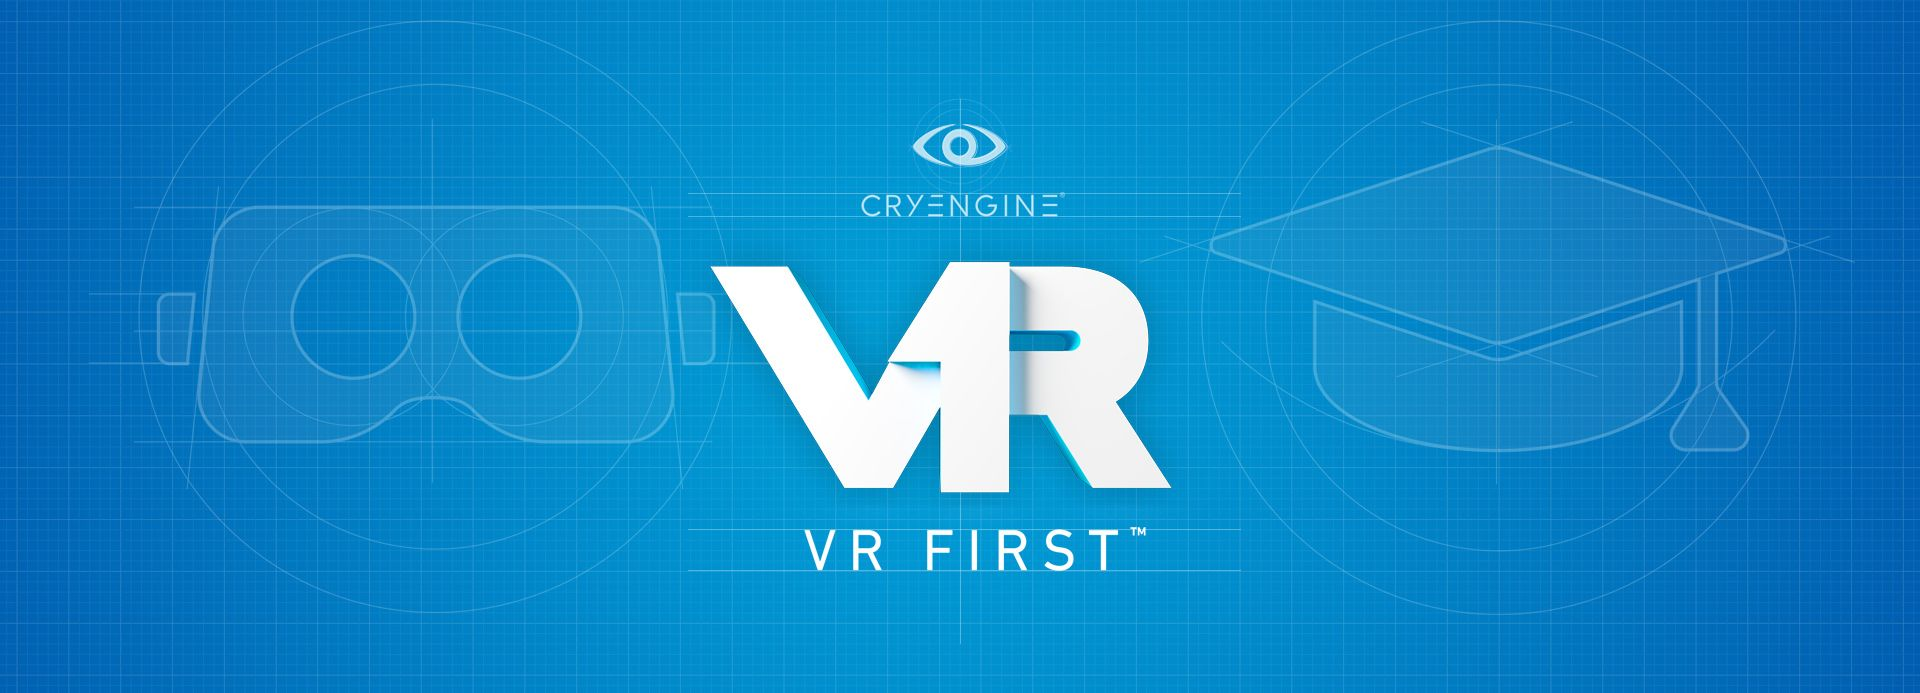 VR FIRST :: Cryengine VR program for academic inst   free